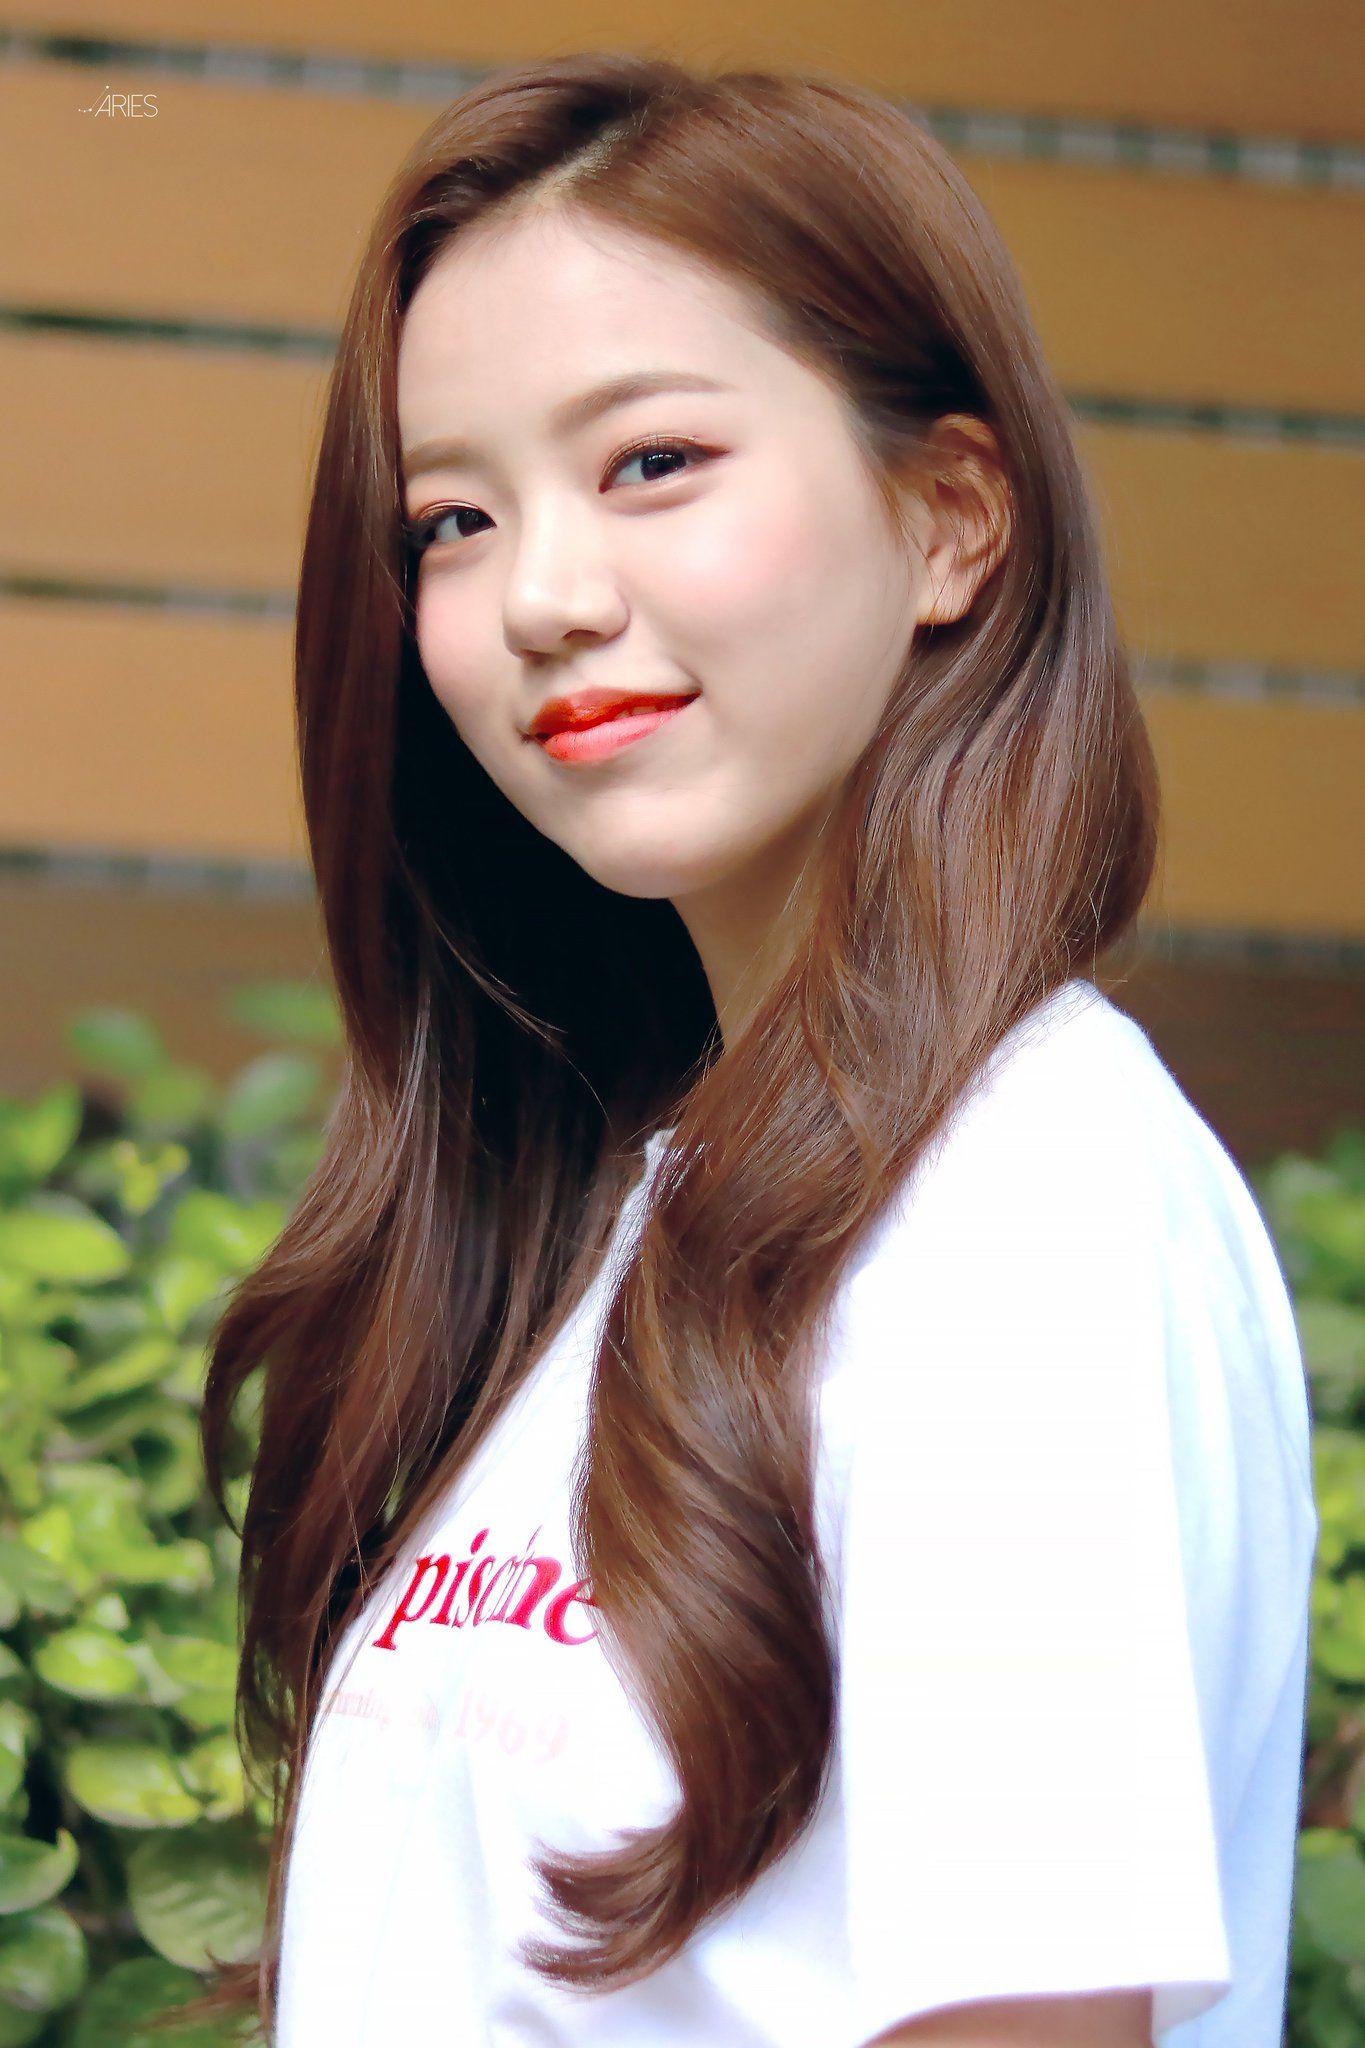 Aries On Twitter Lena Girl Kpop Idol